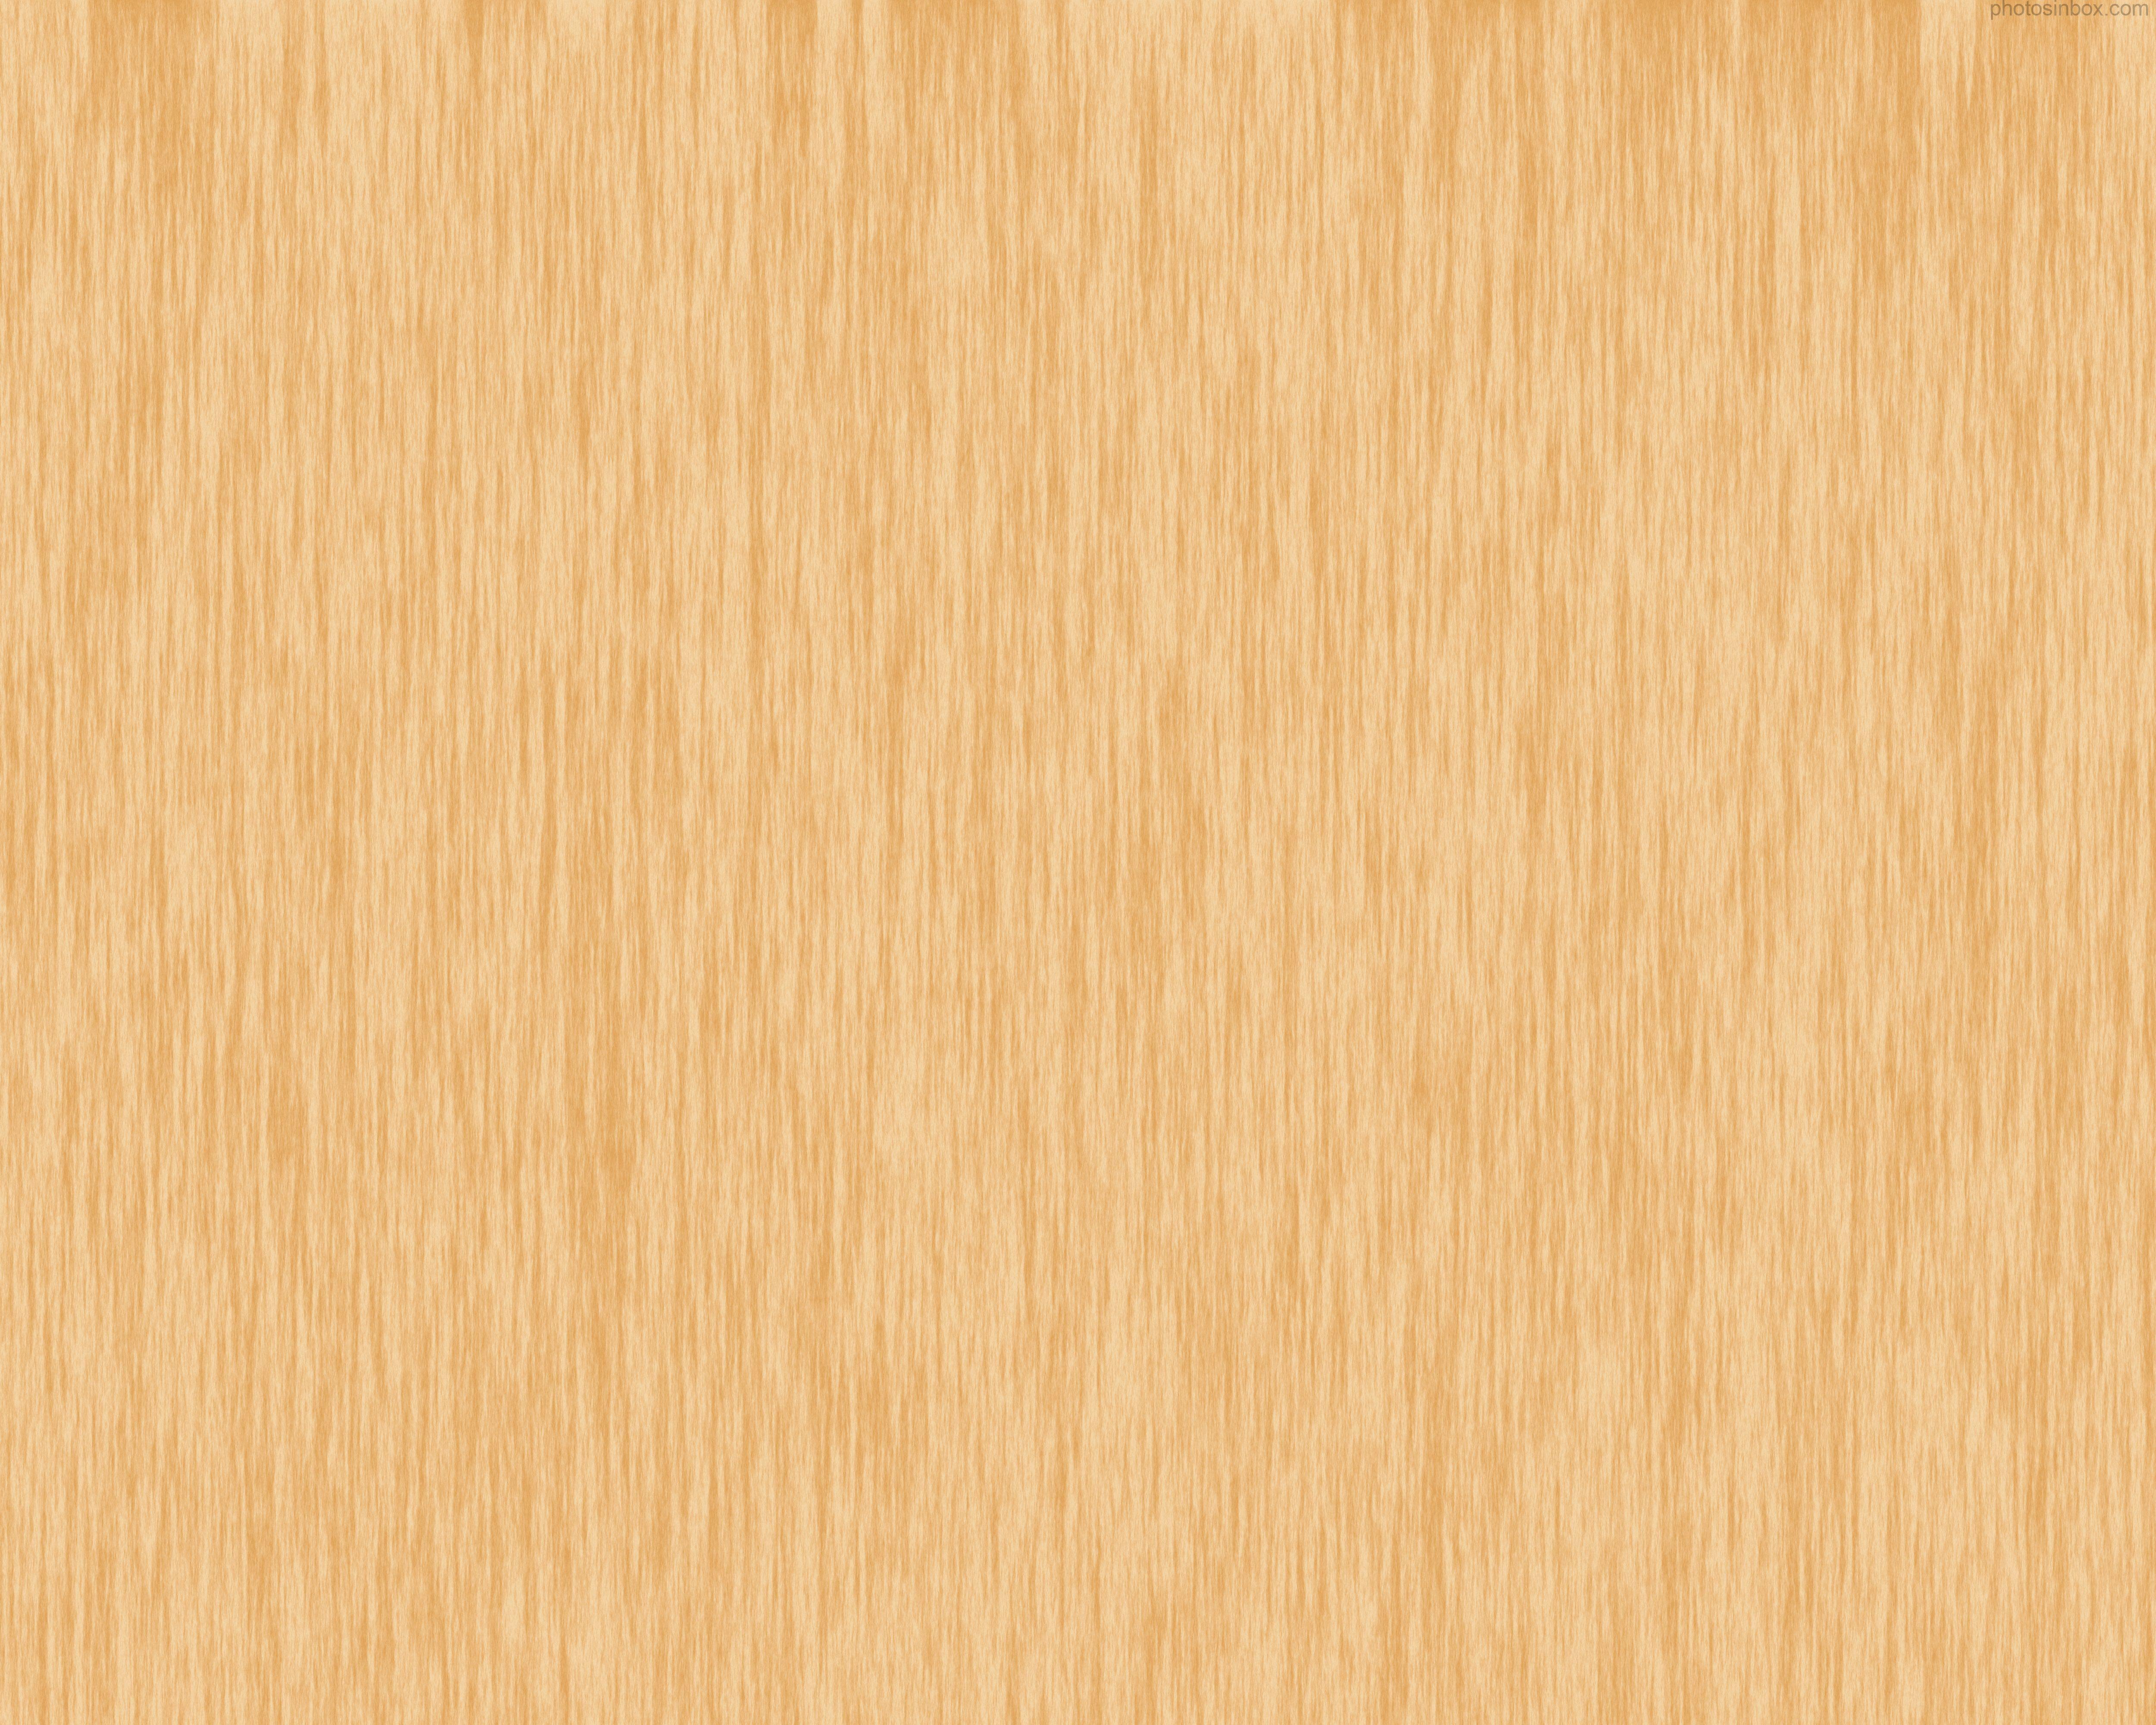 Wood furniture texture - Light Wood Texture Jpg 5000 4000